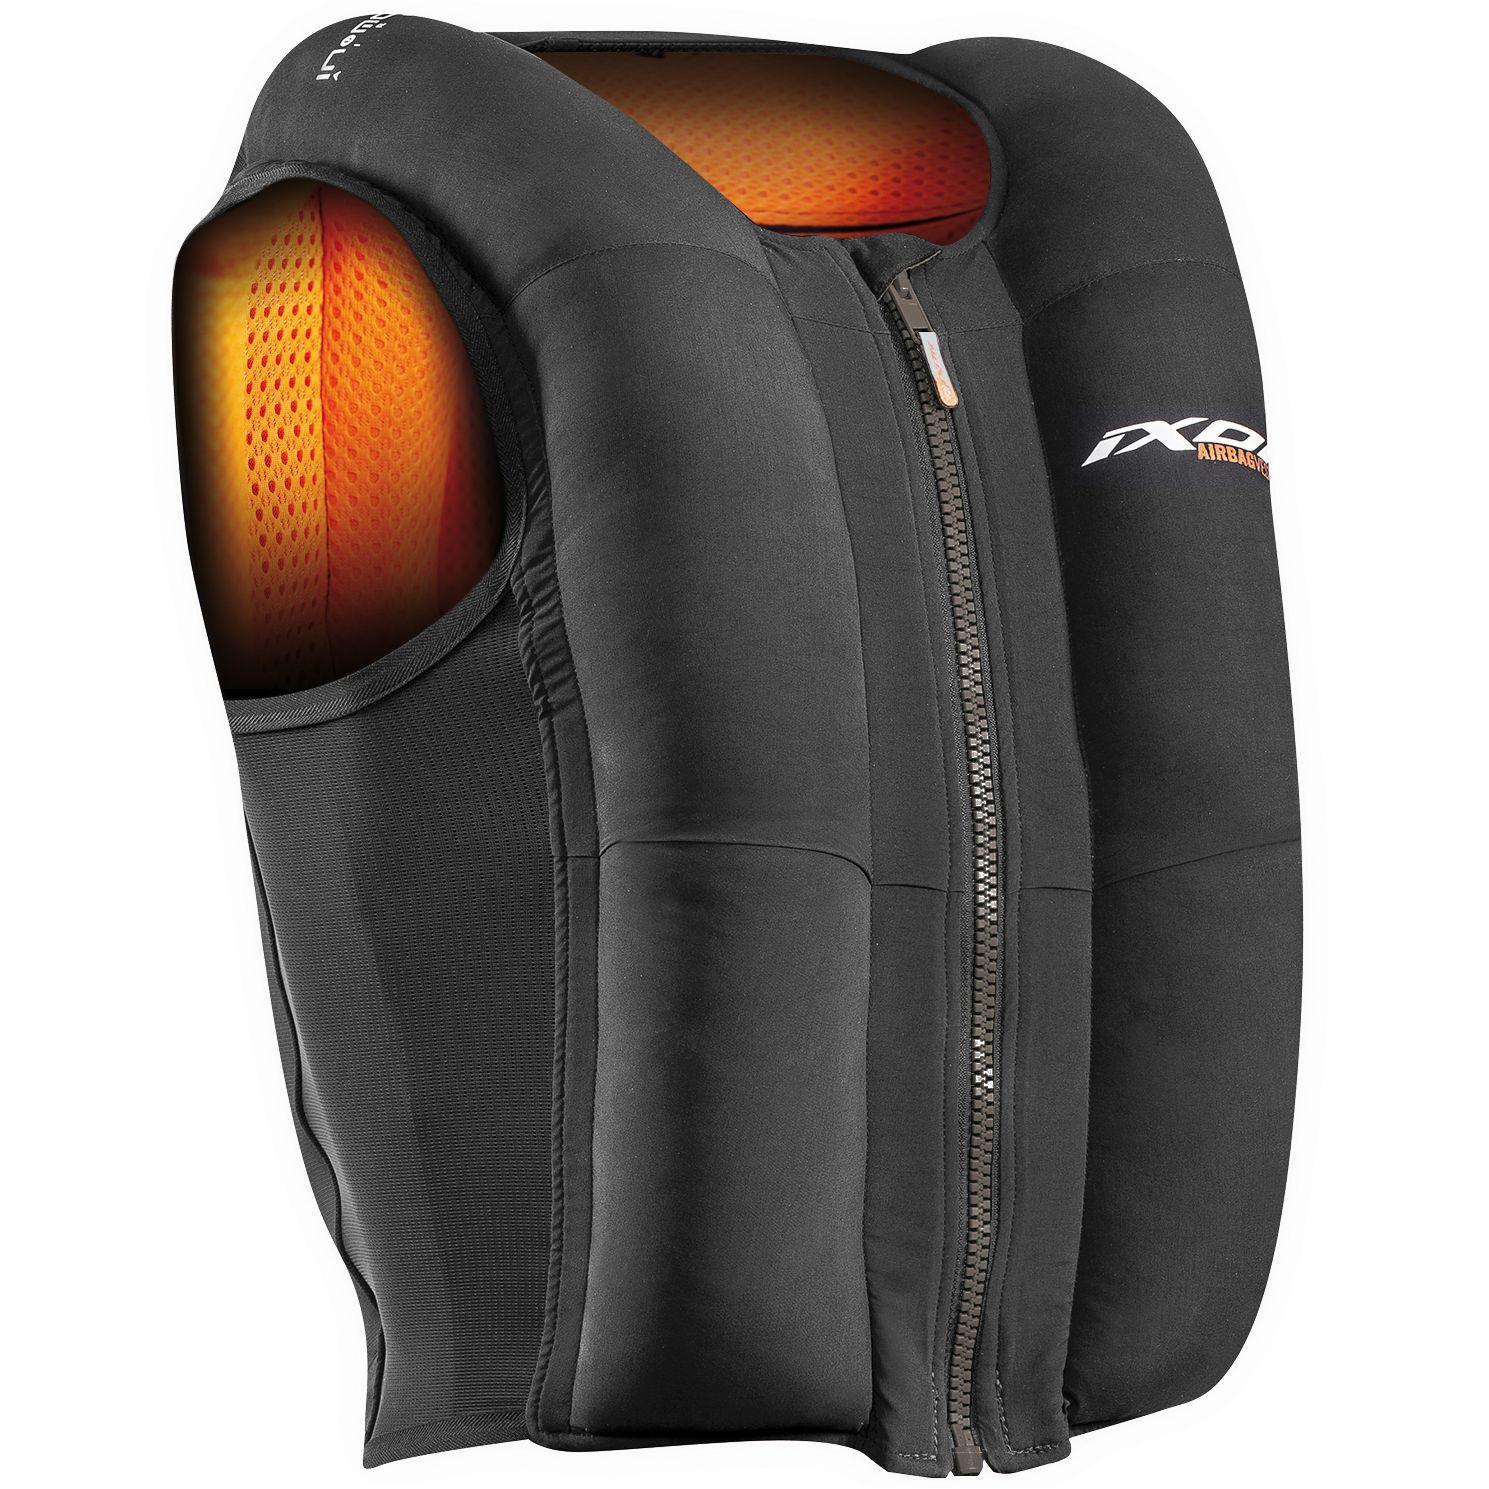 Gilet Airbag Ixon IX-Airbag U03 - Tailles au choix (In&box obligatoire)